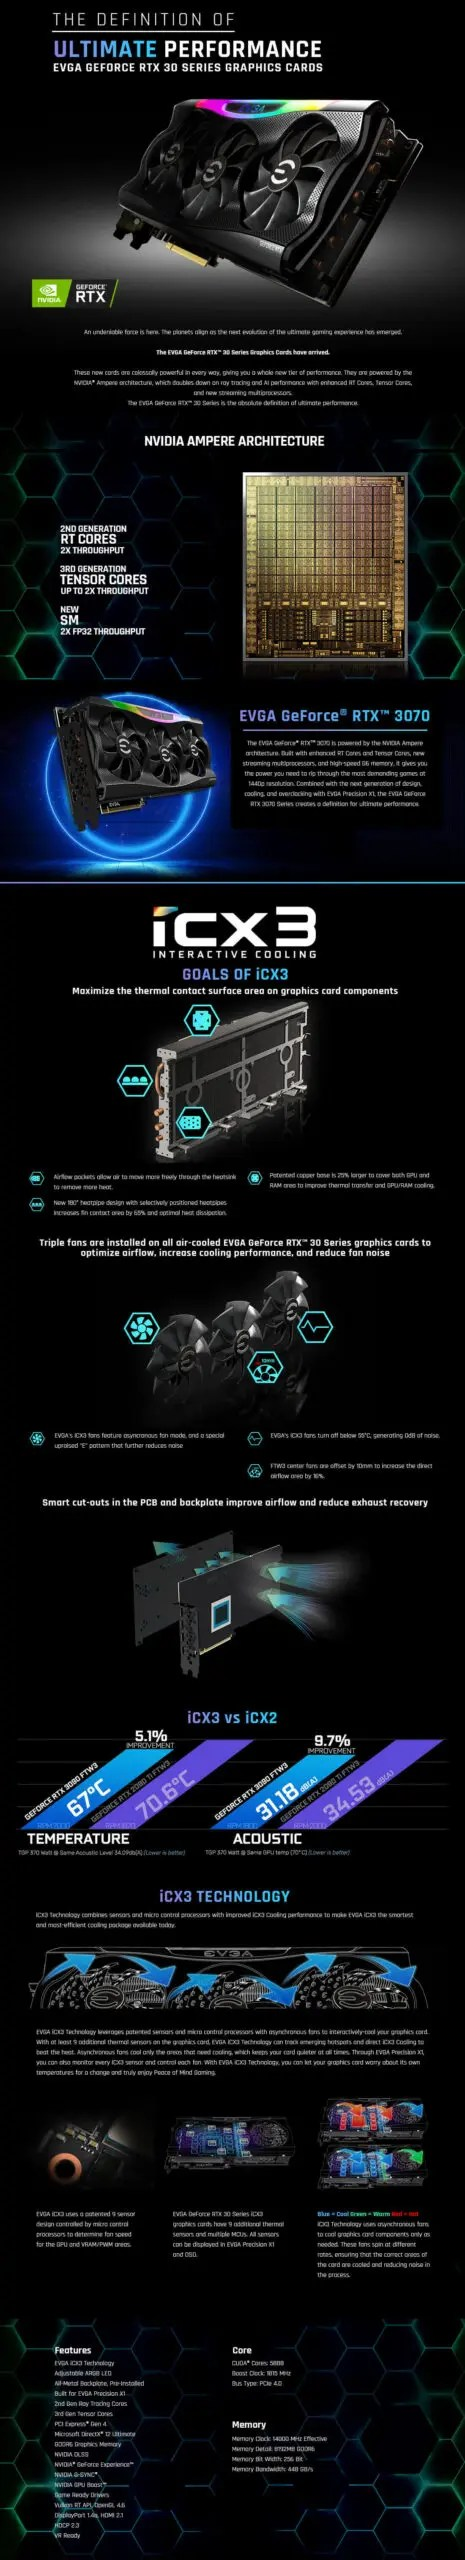 EVGA GeForce RTX 3070 FTW3 ULTRA GAMING Graphics Card (08G-P5-3767-KR)